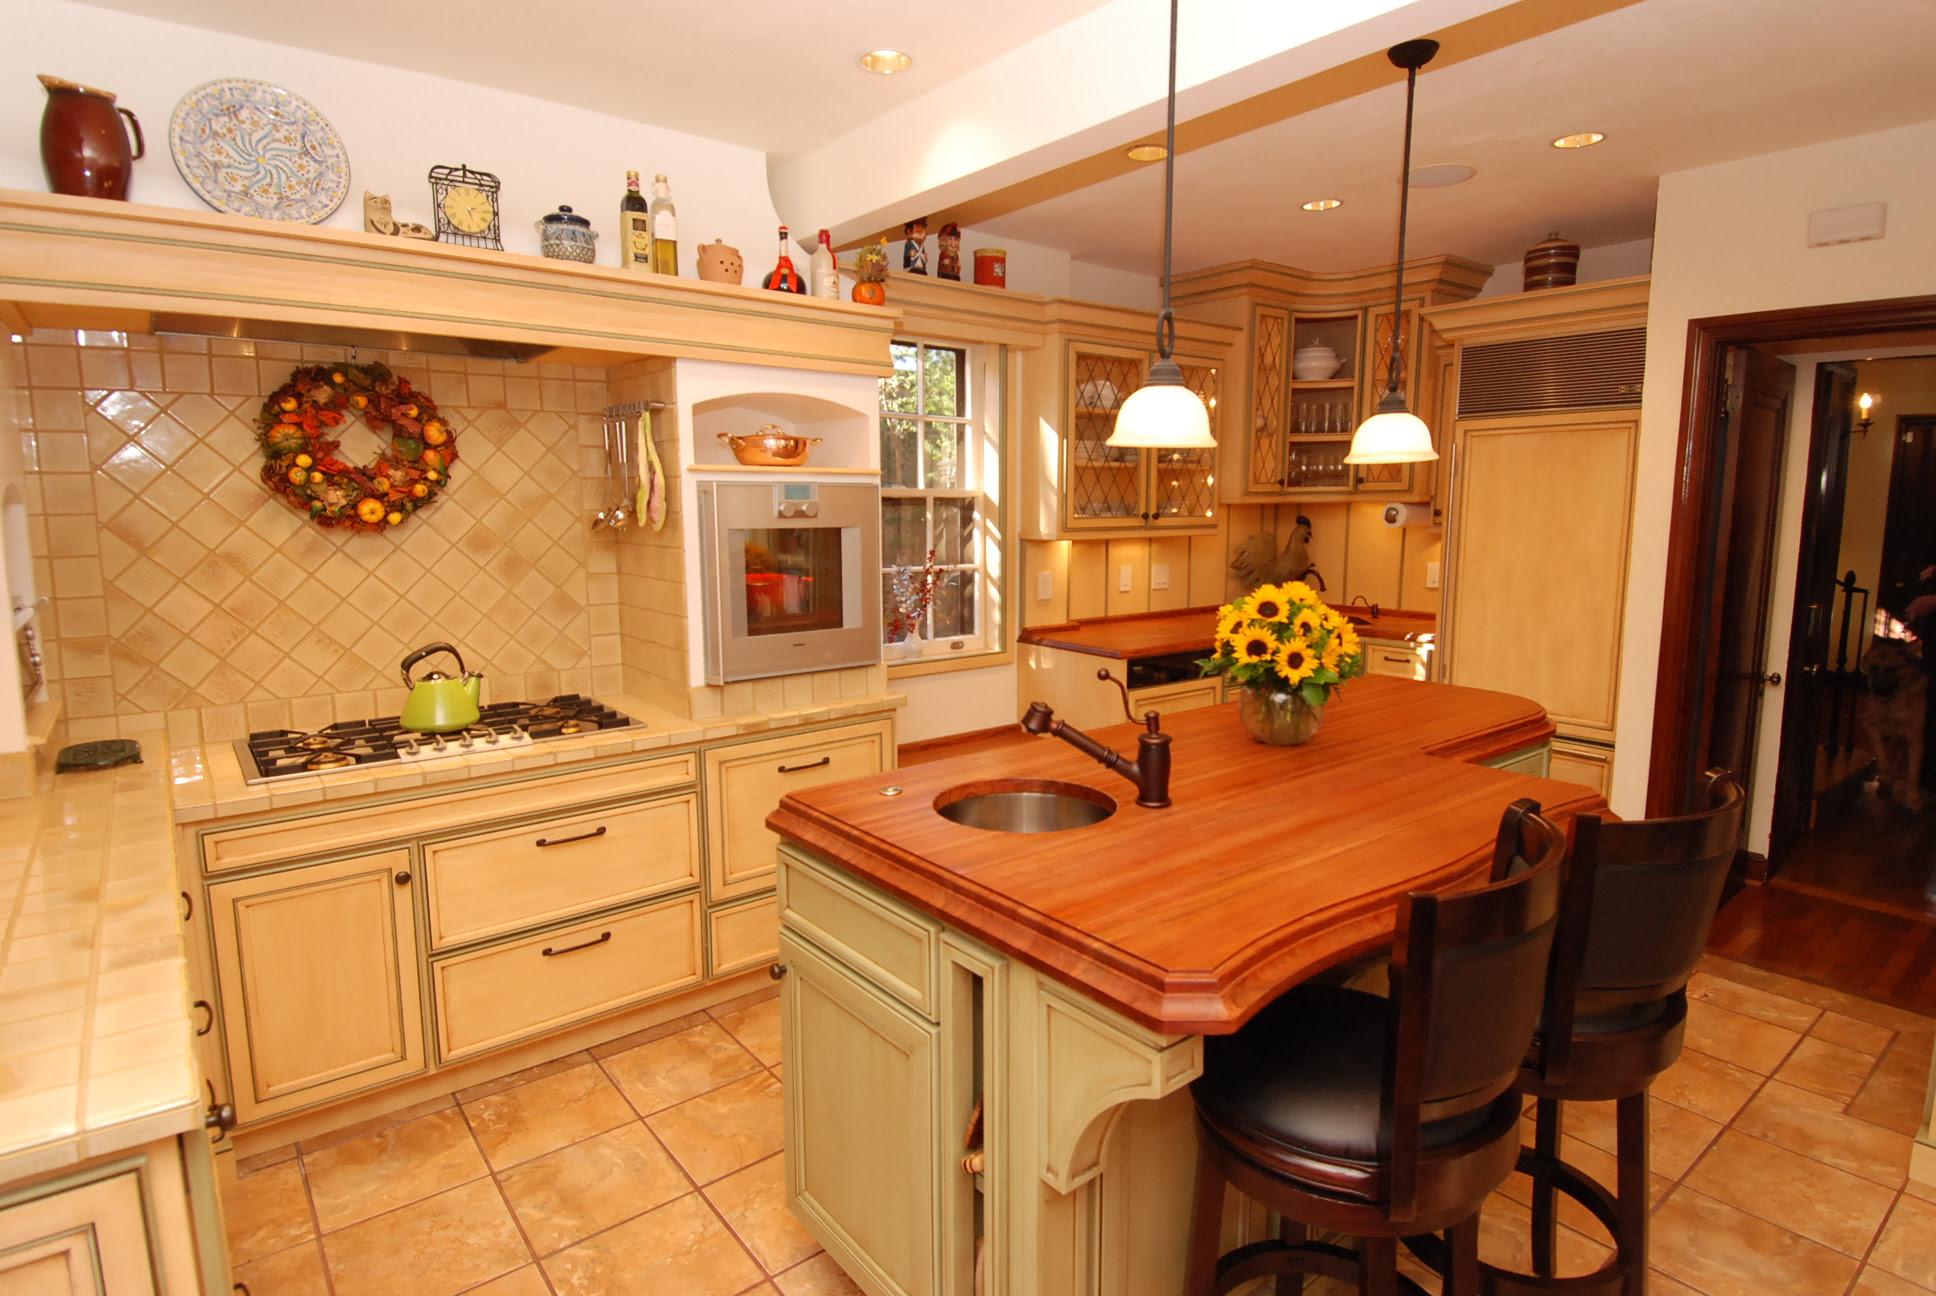 Warm Farmhouse Kitchen - Cabinets by Graber